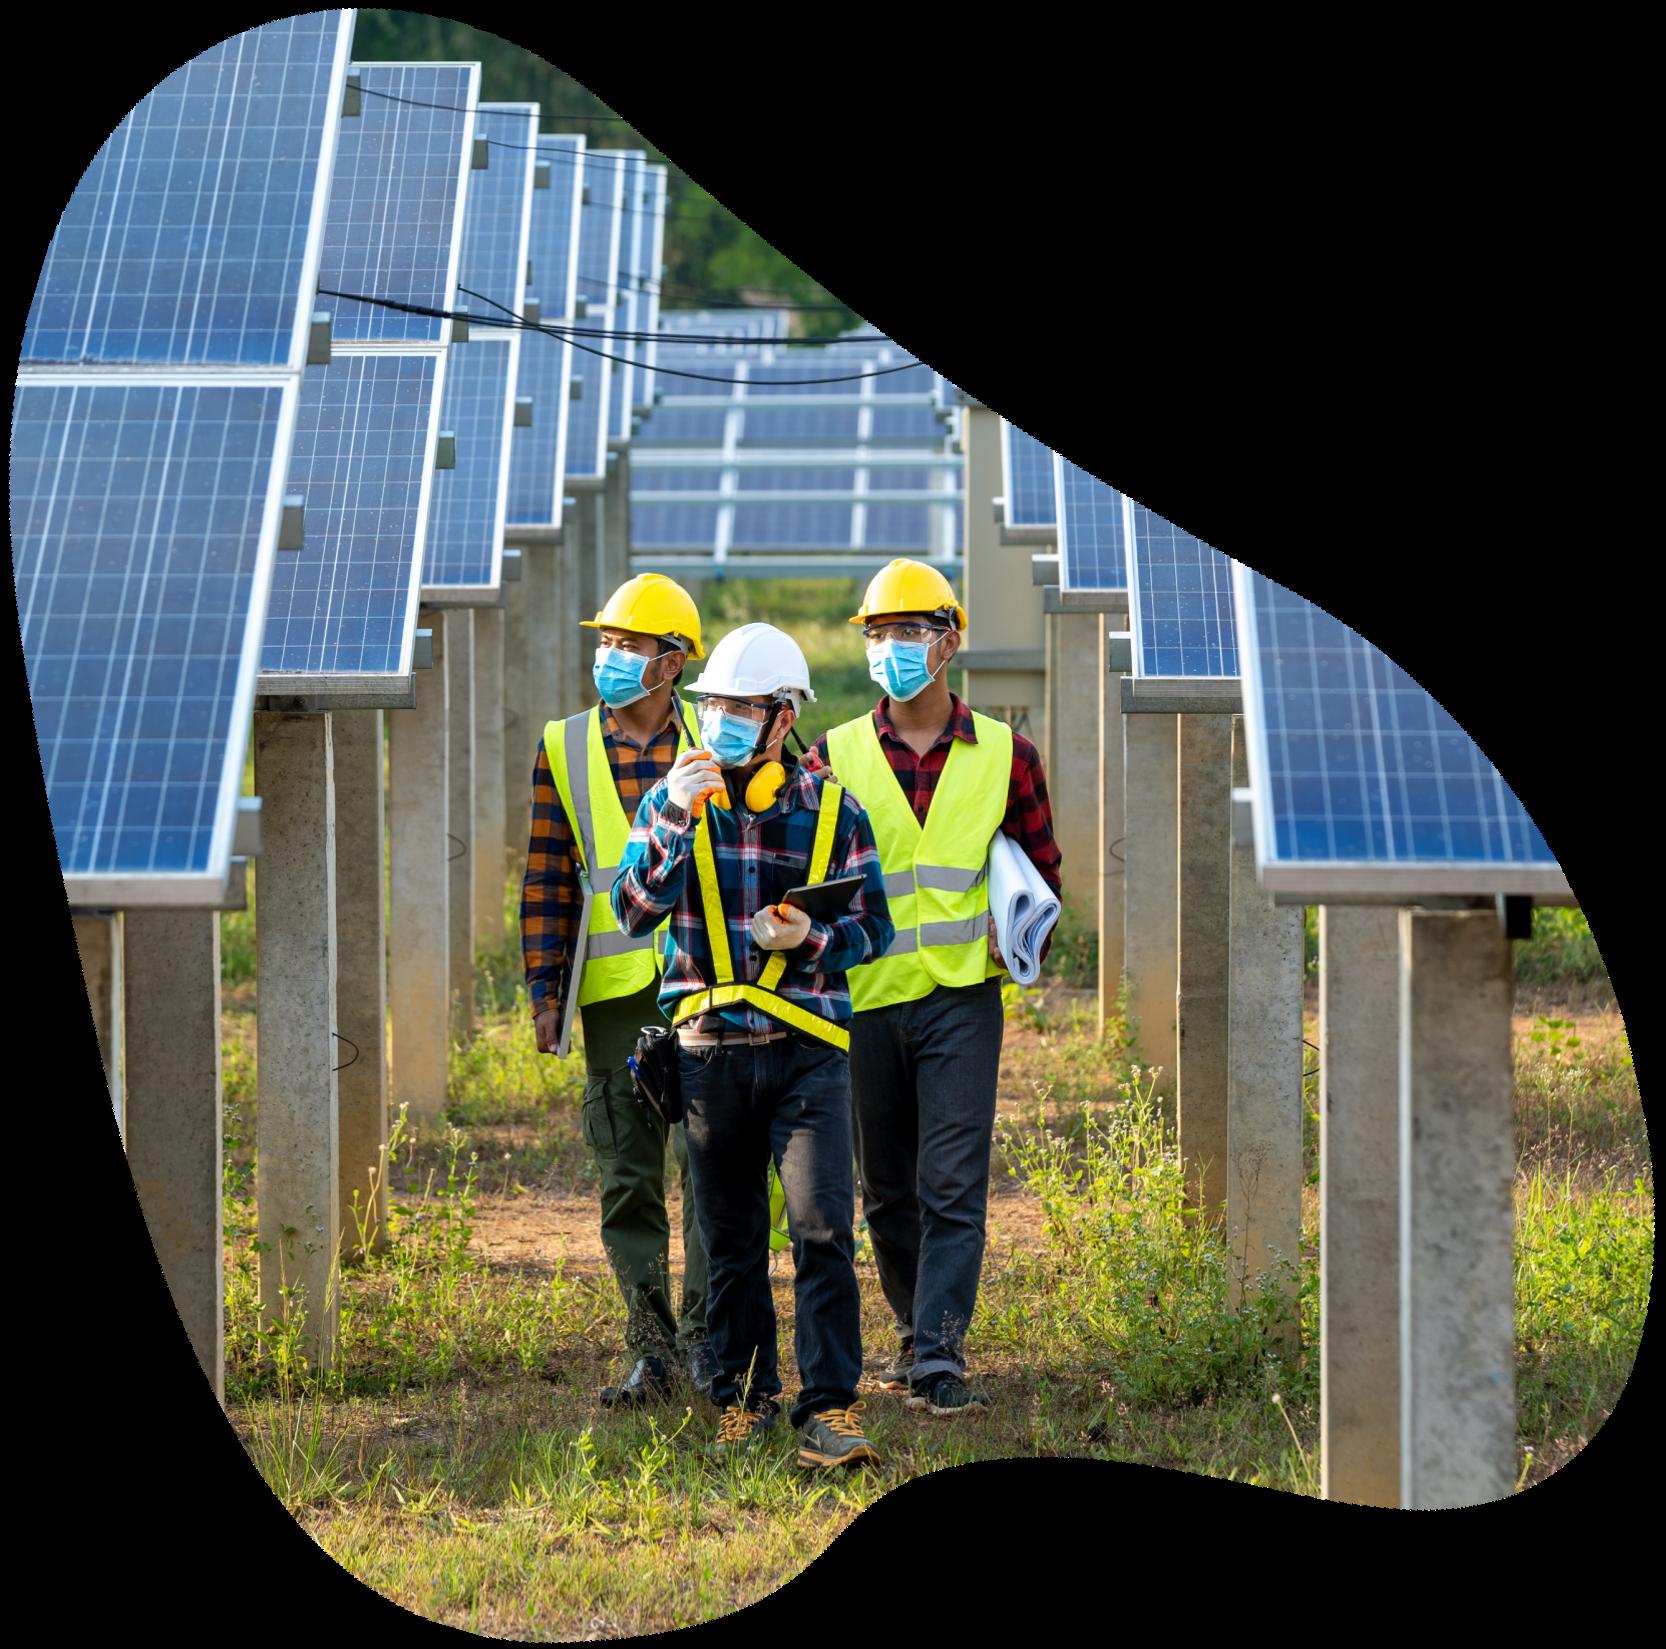 People in hard hats walking through solar panel field